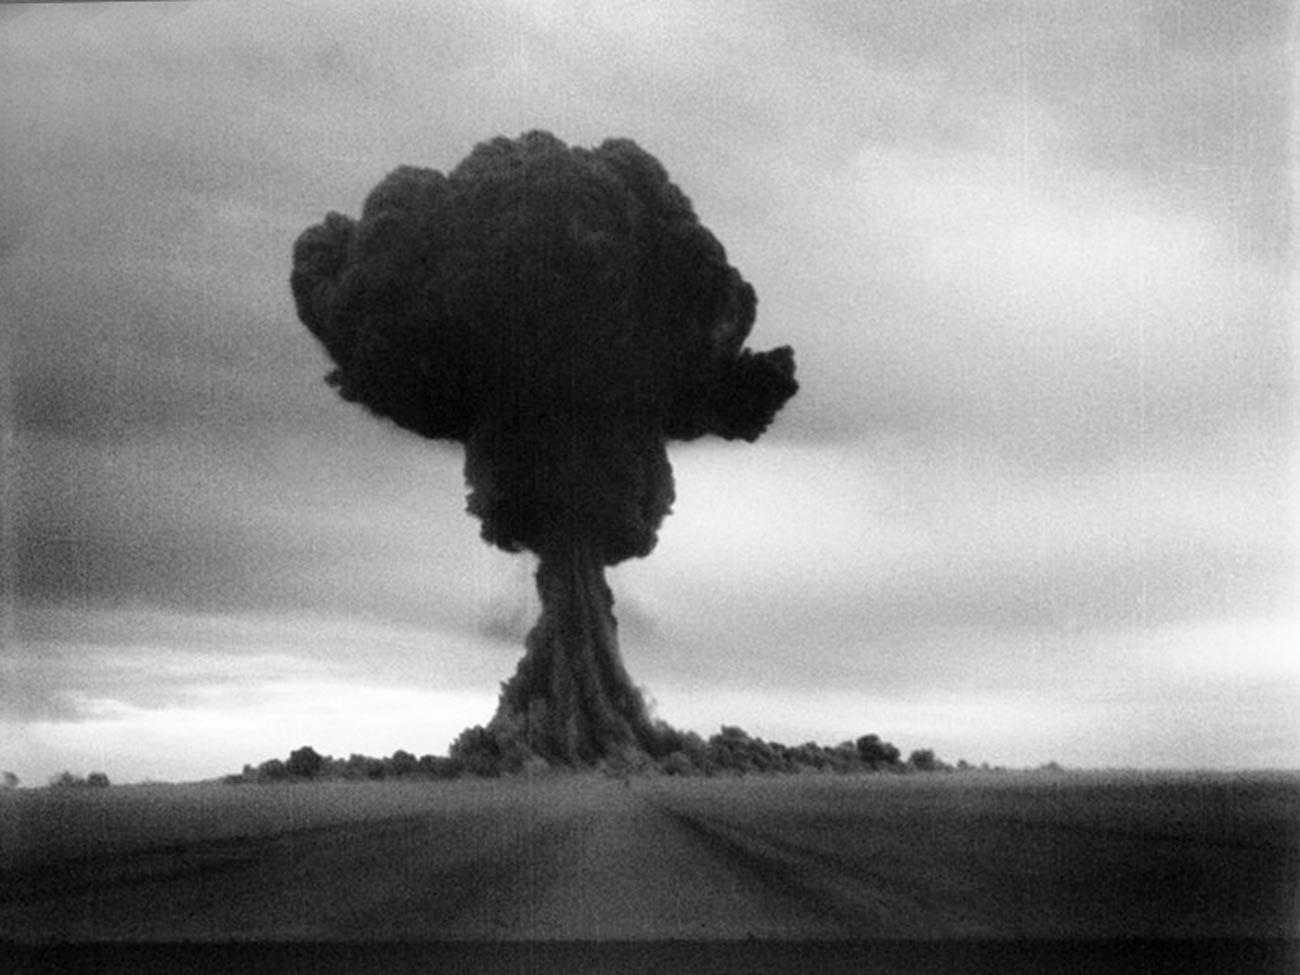 Der erste sowjetische Atombombentest.